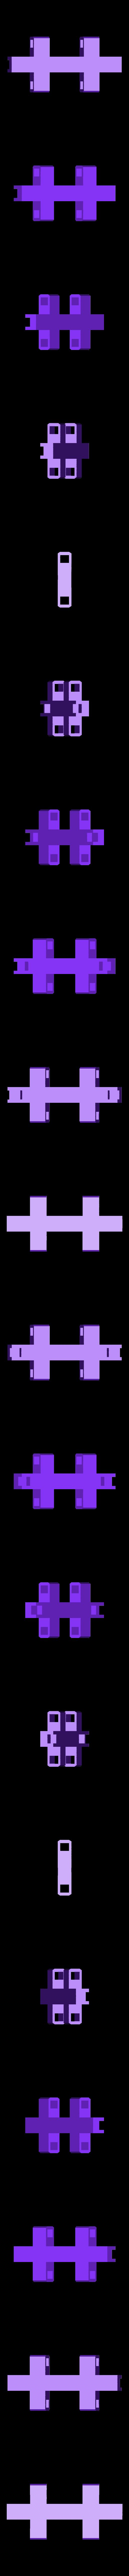 mini_T-34_track1.stl Download STL file Mini T-34 • 3D printer model, c47